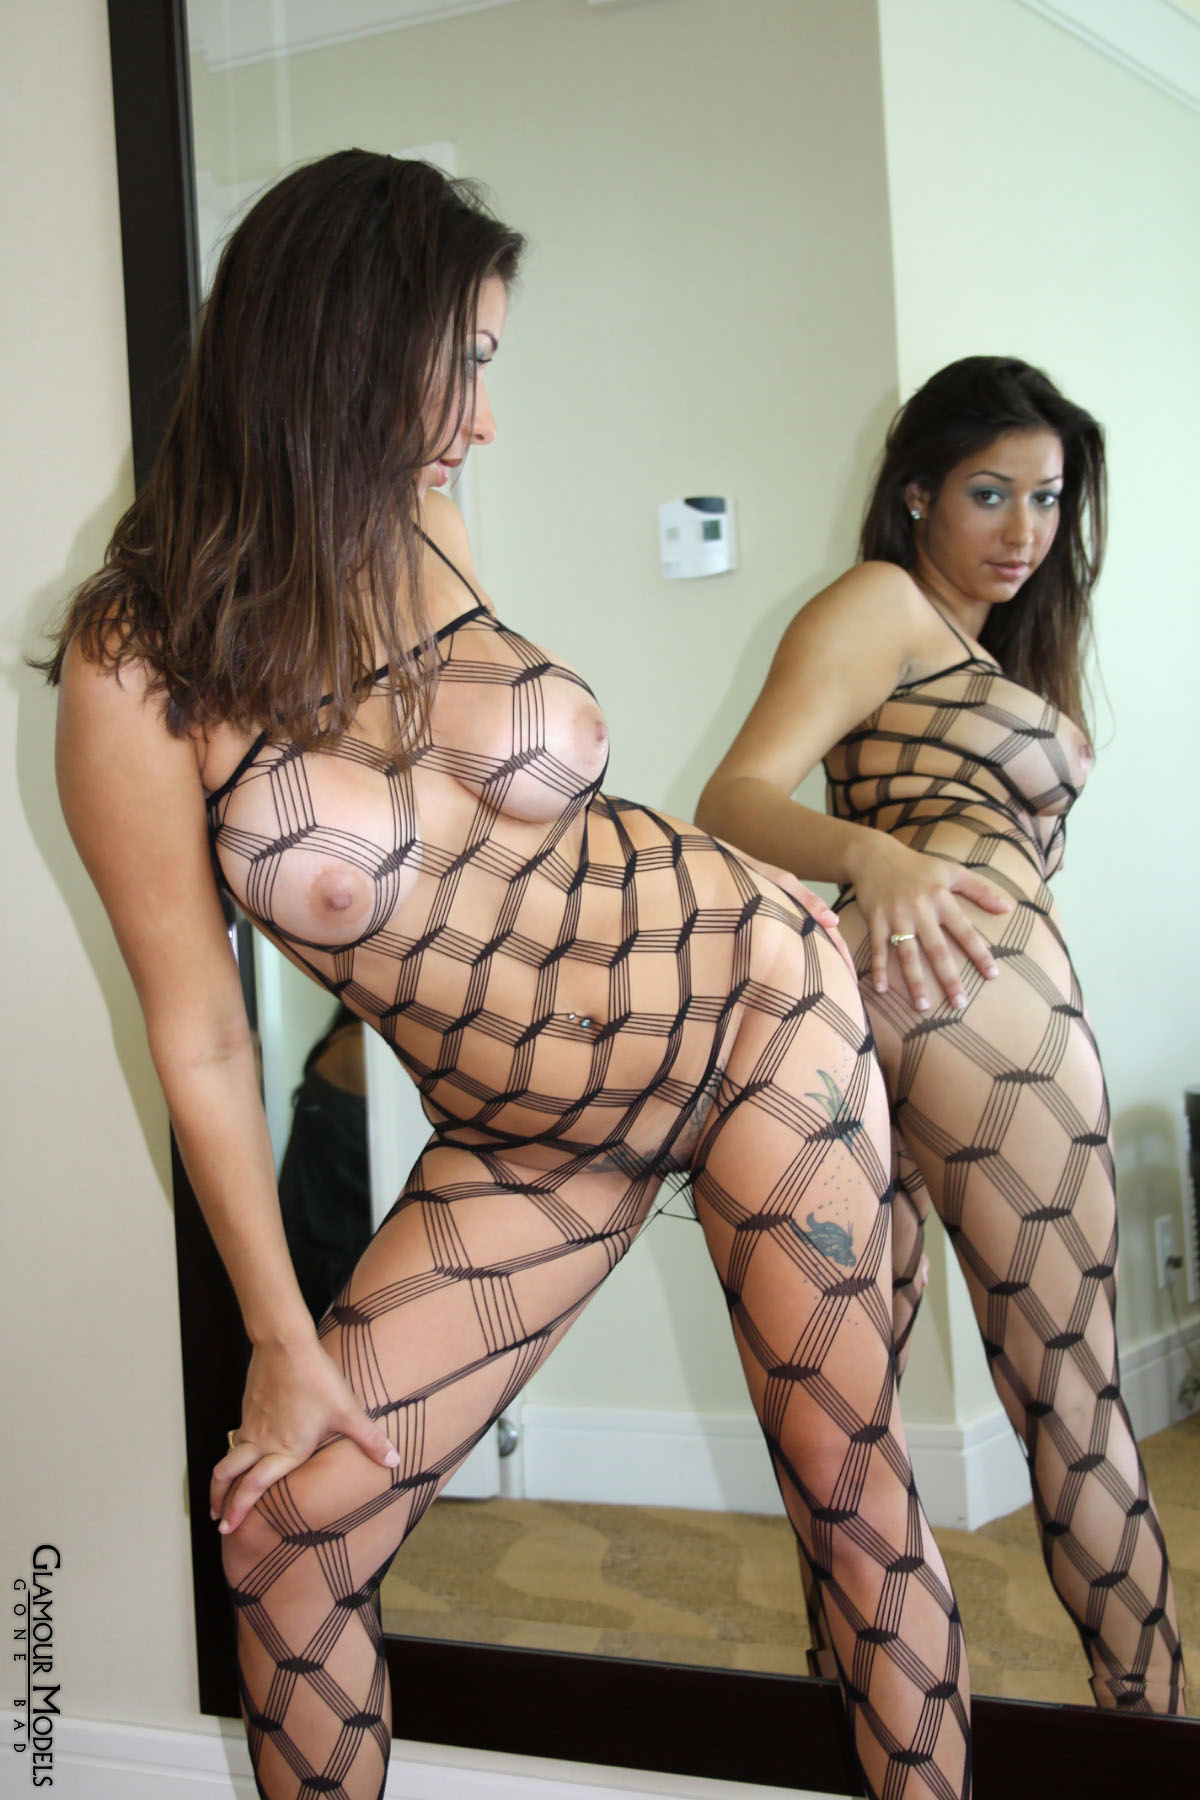 Jen Capone ser hot i fuld kropsramning 4588-9016